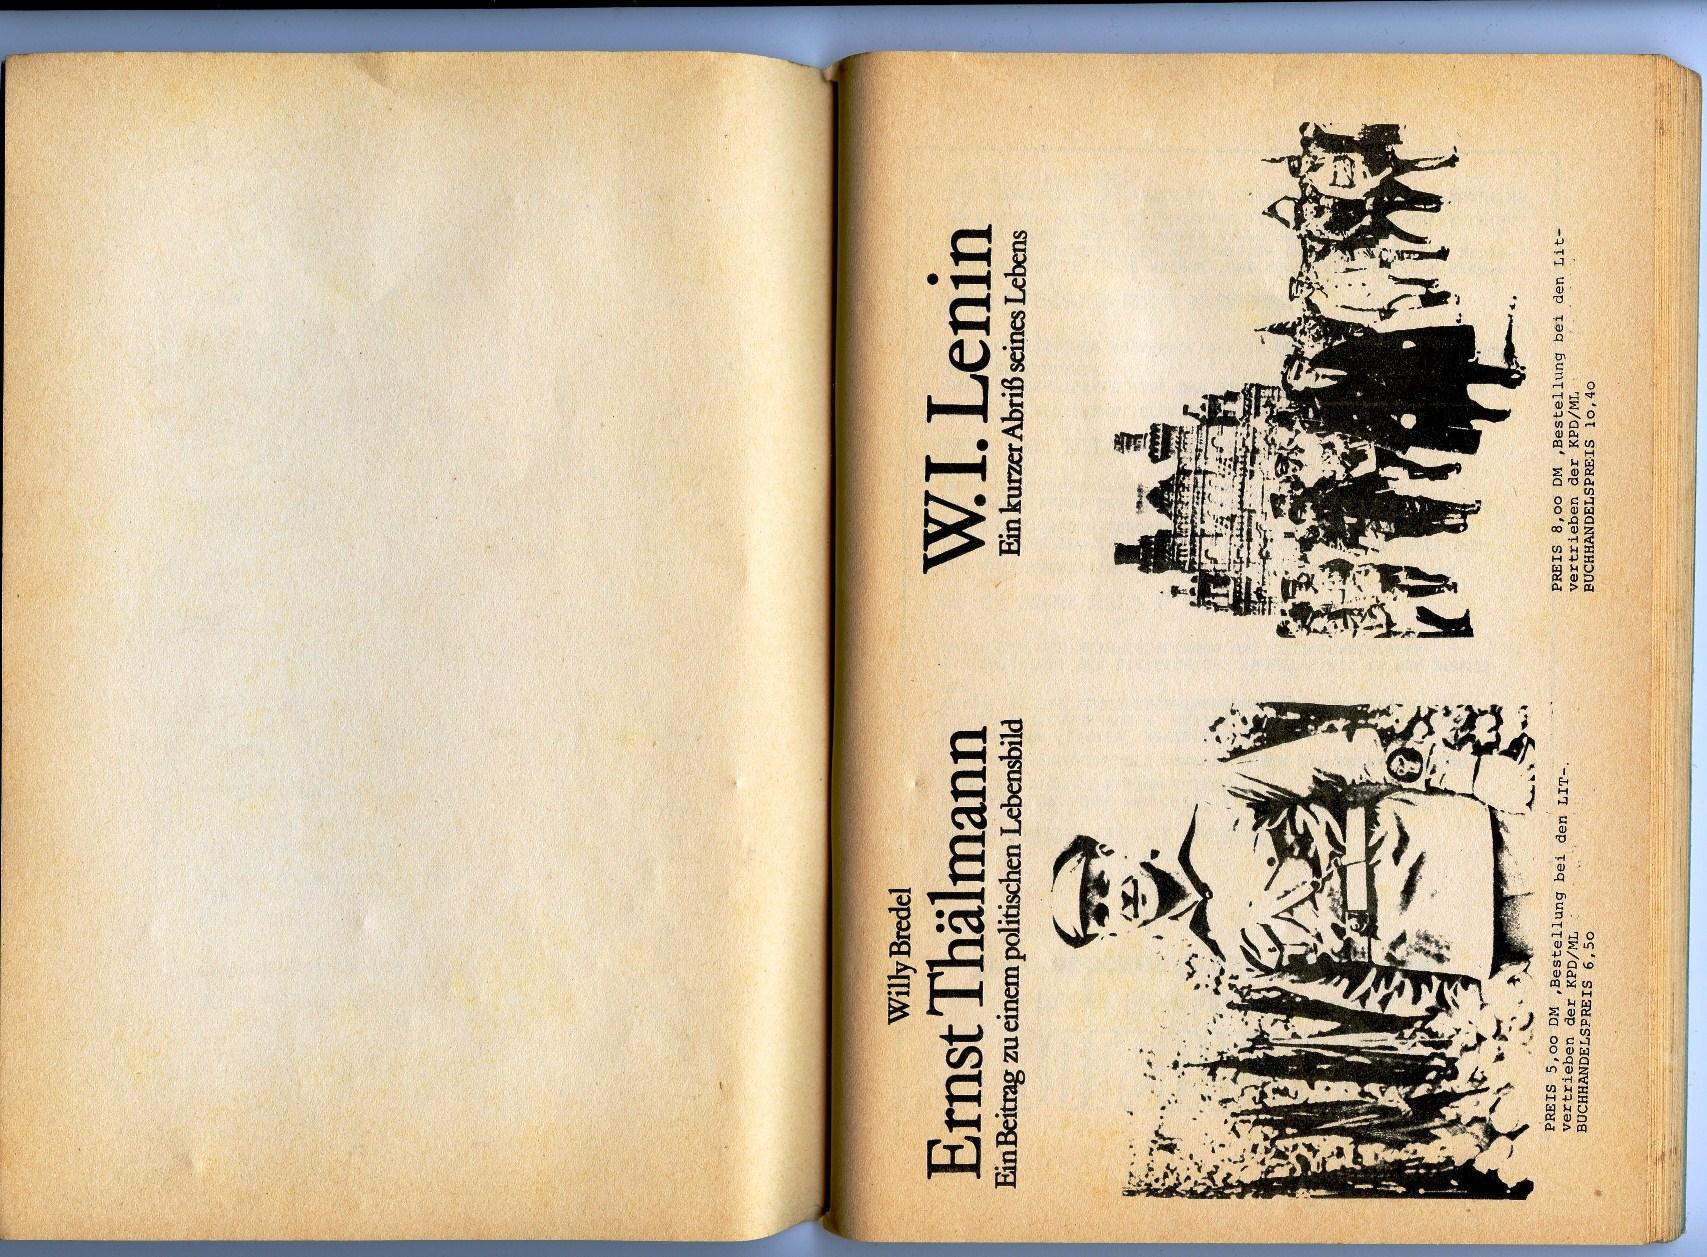 ZB_Parteiarbeiter_1971_08_57